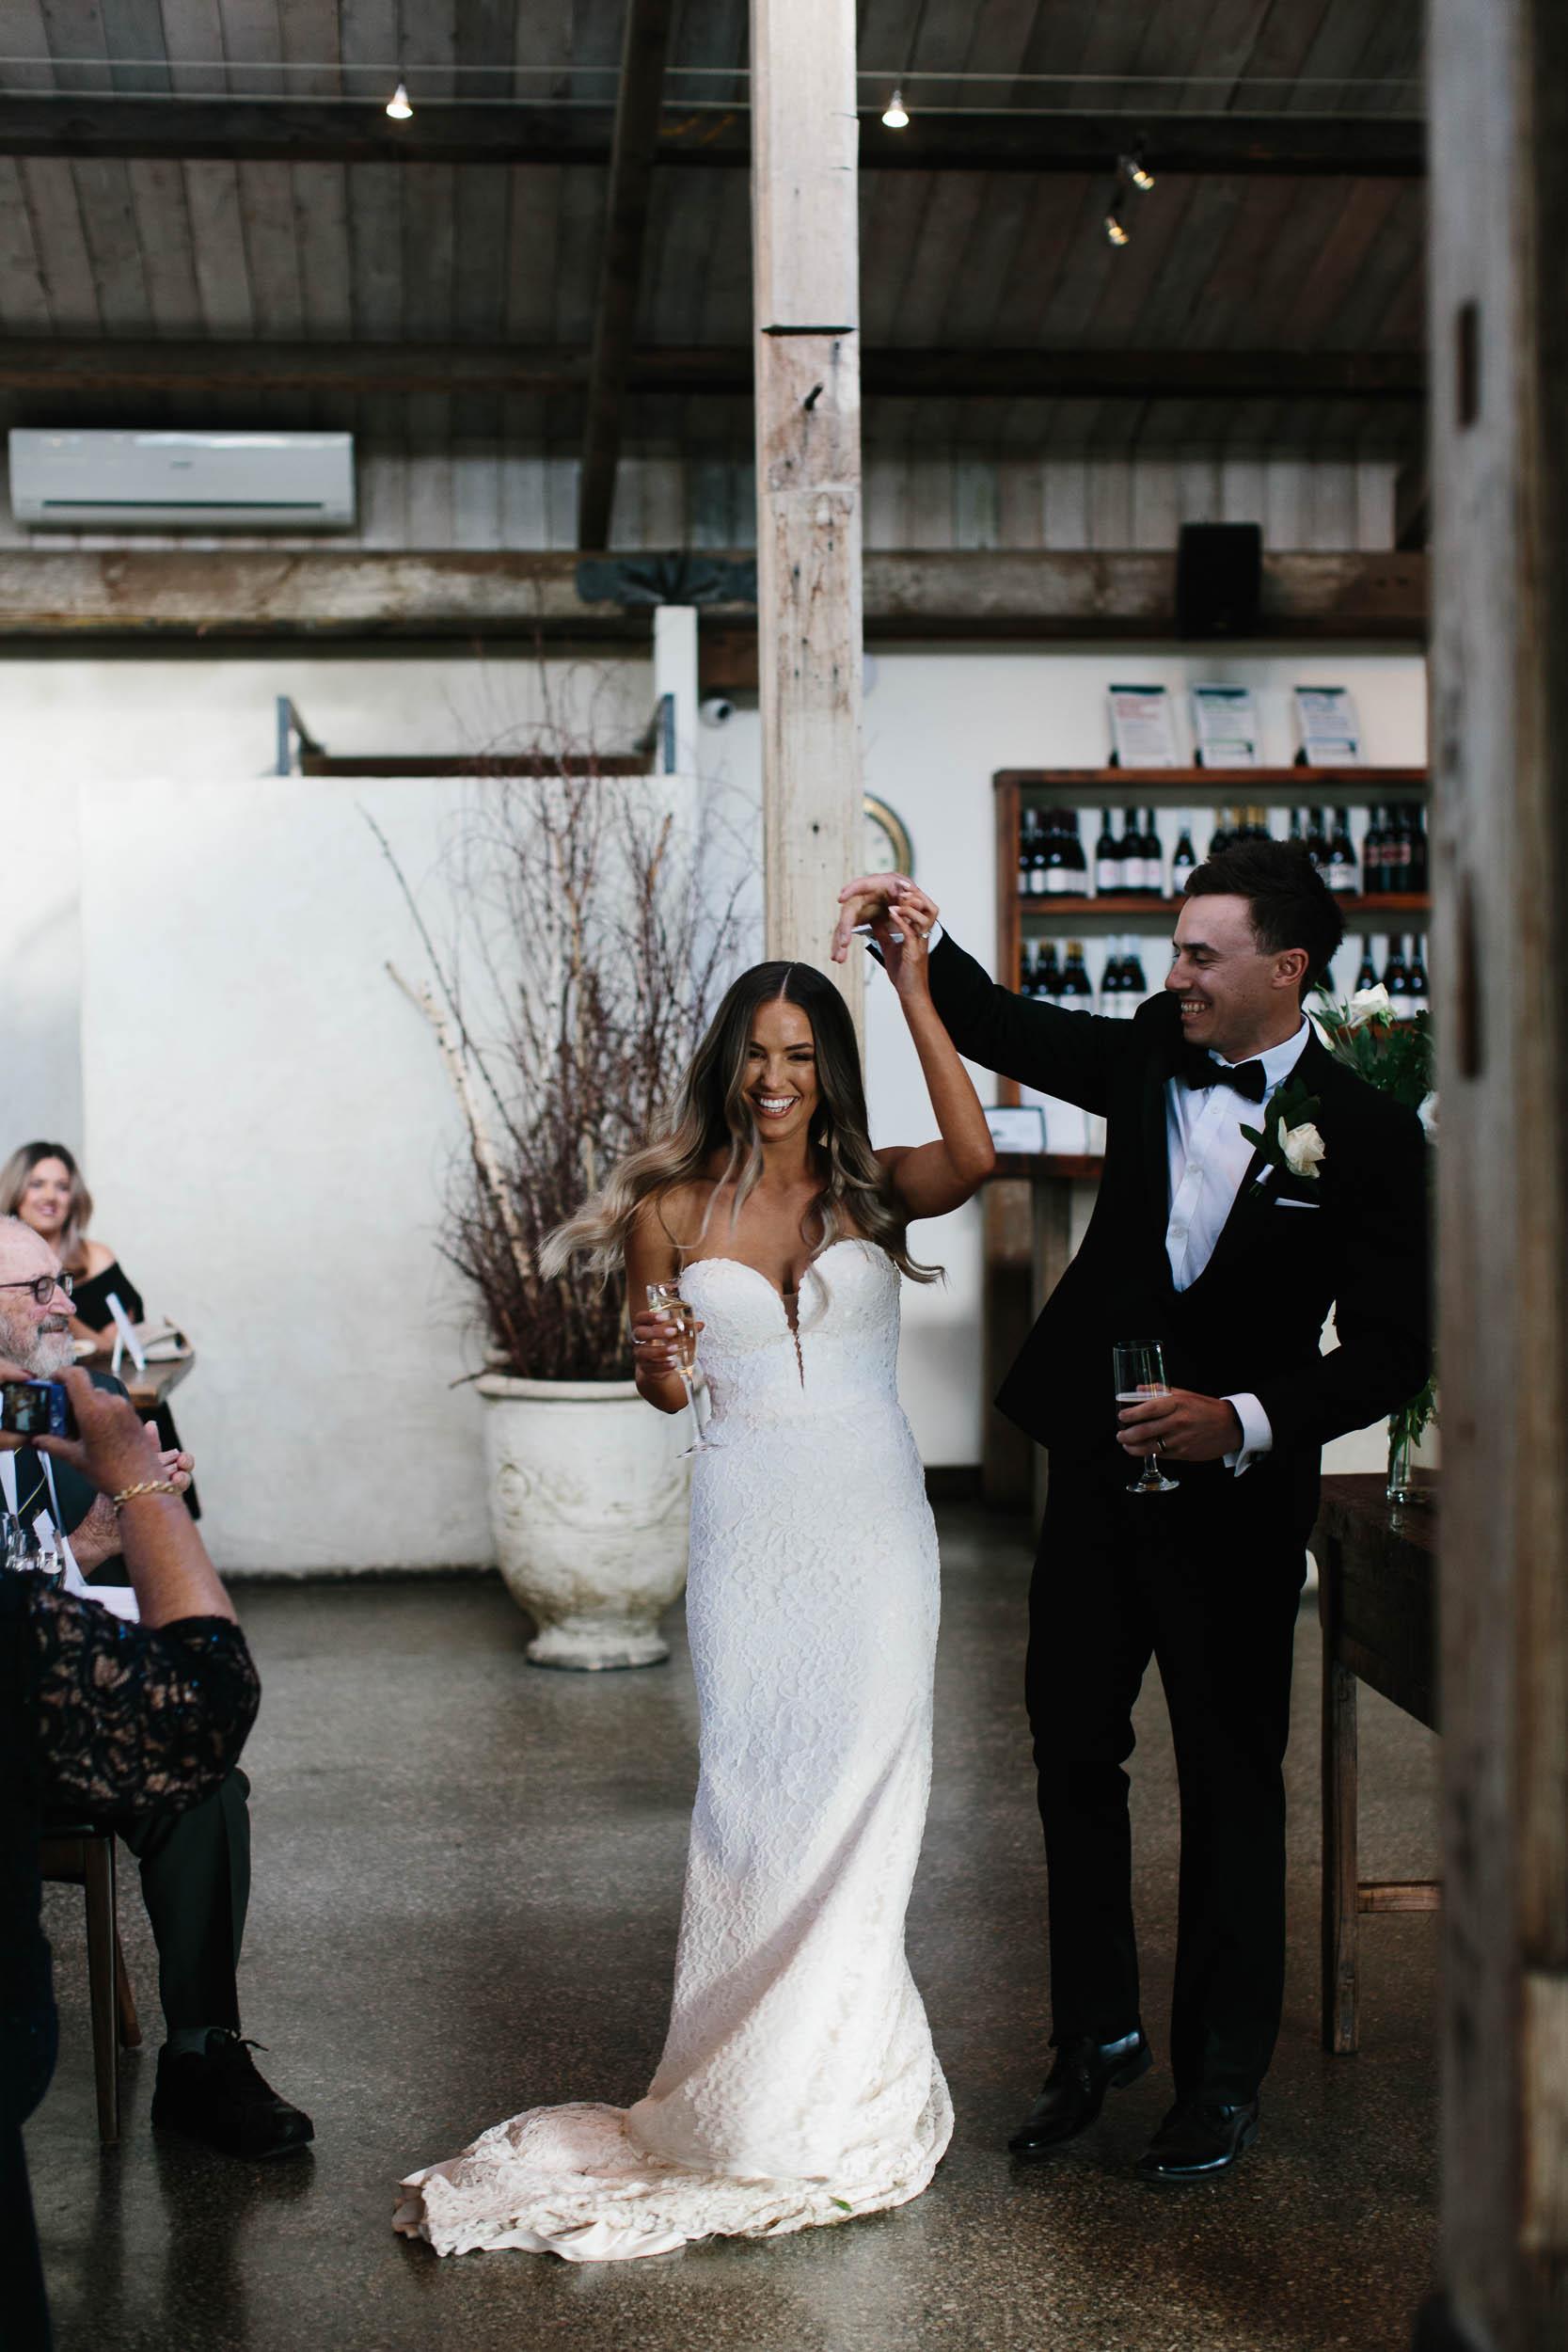 Kas-Richards-Stones-of-the-Yarra-Valley-Wedding-706.jpg